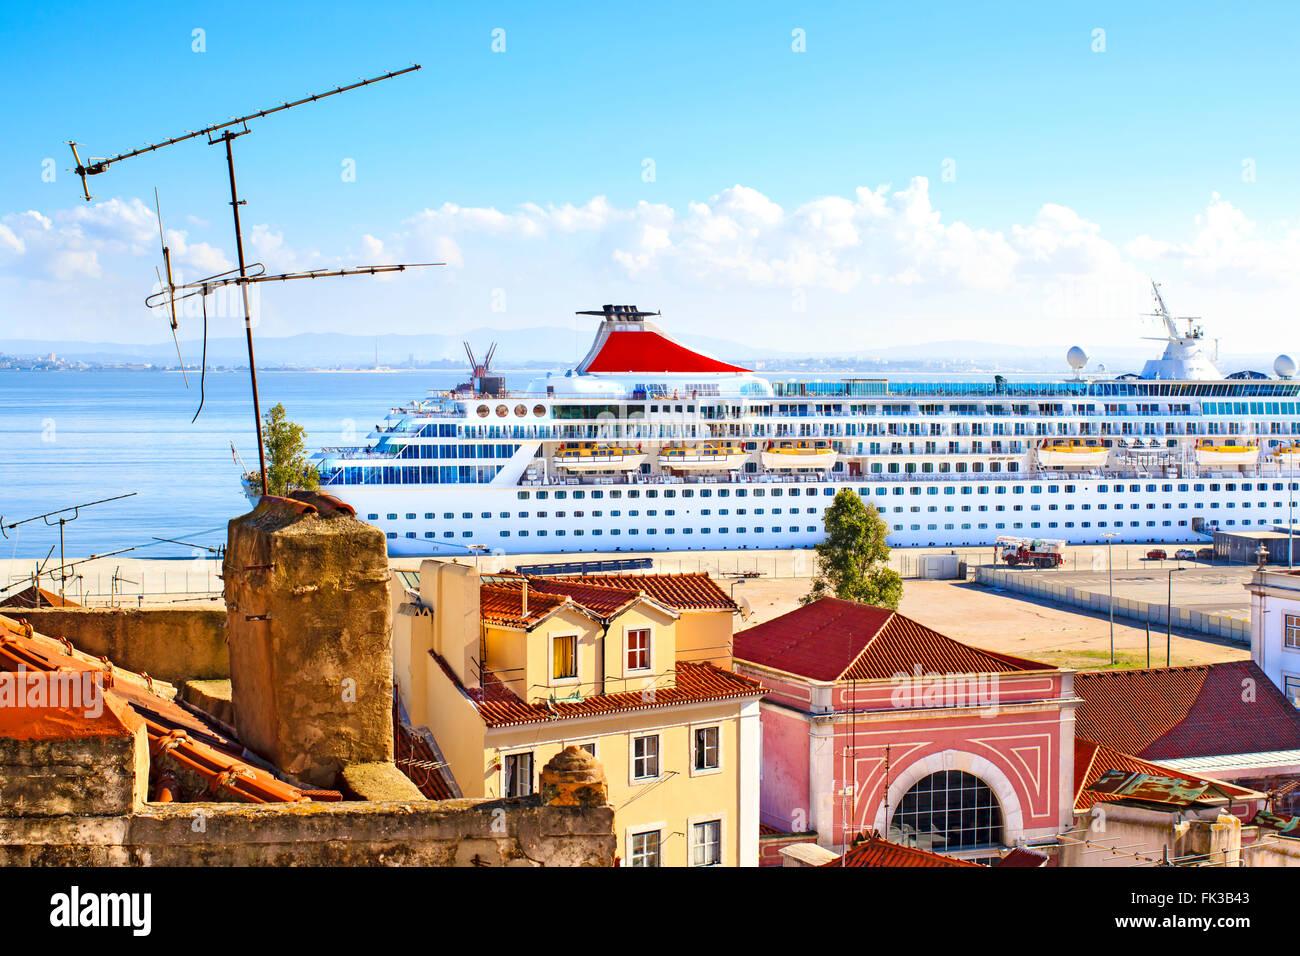 Huge cruise liner moored in Lisbon, Portugal - Stock Image